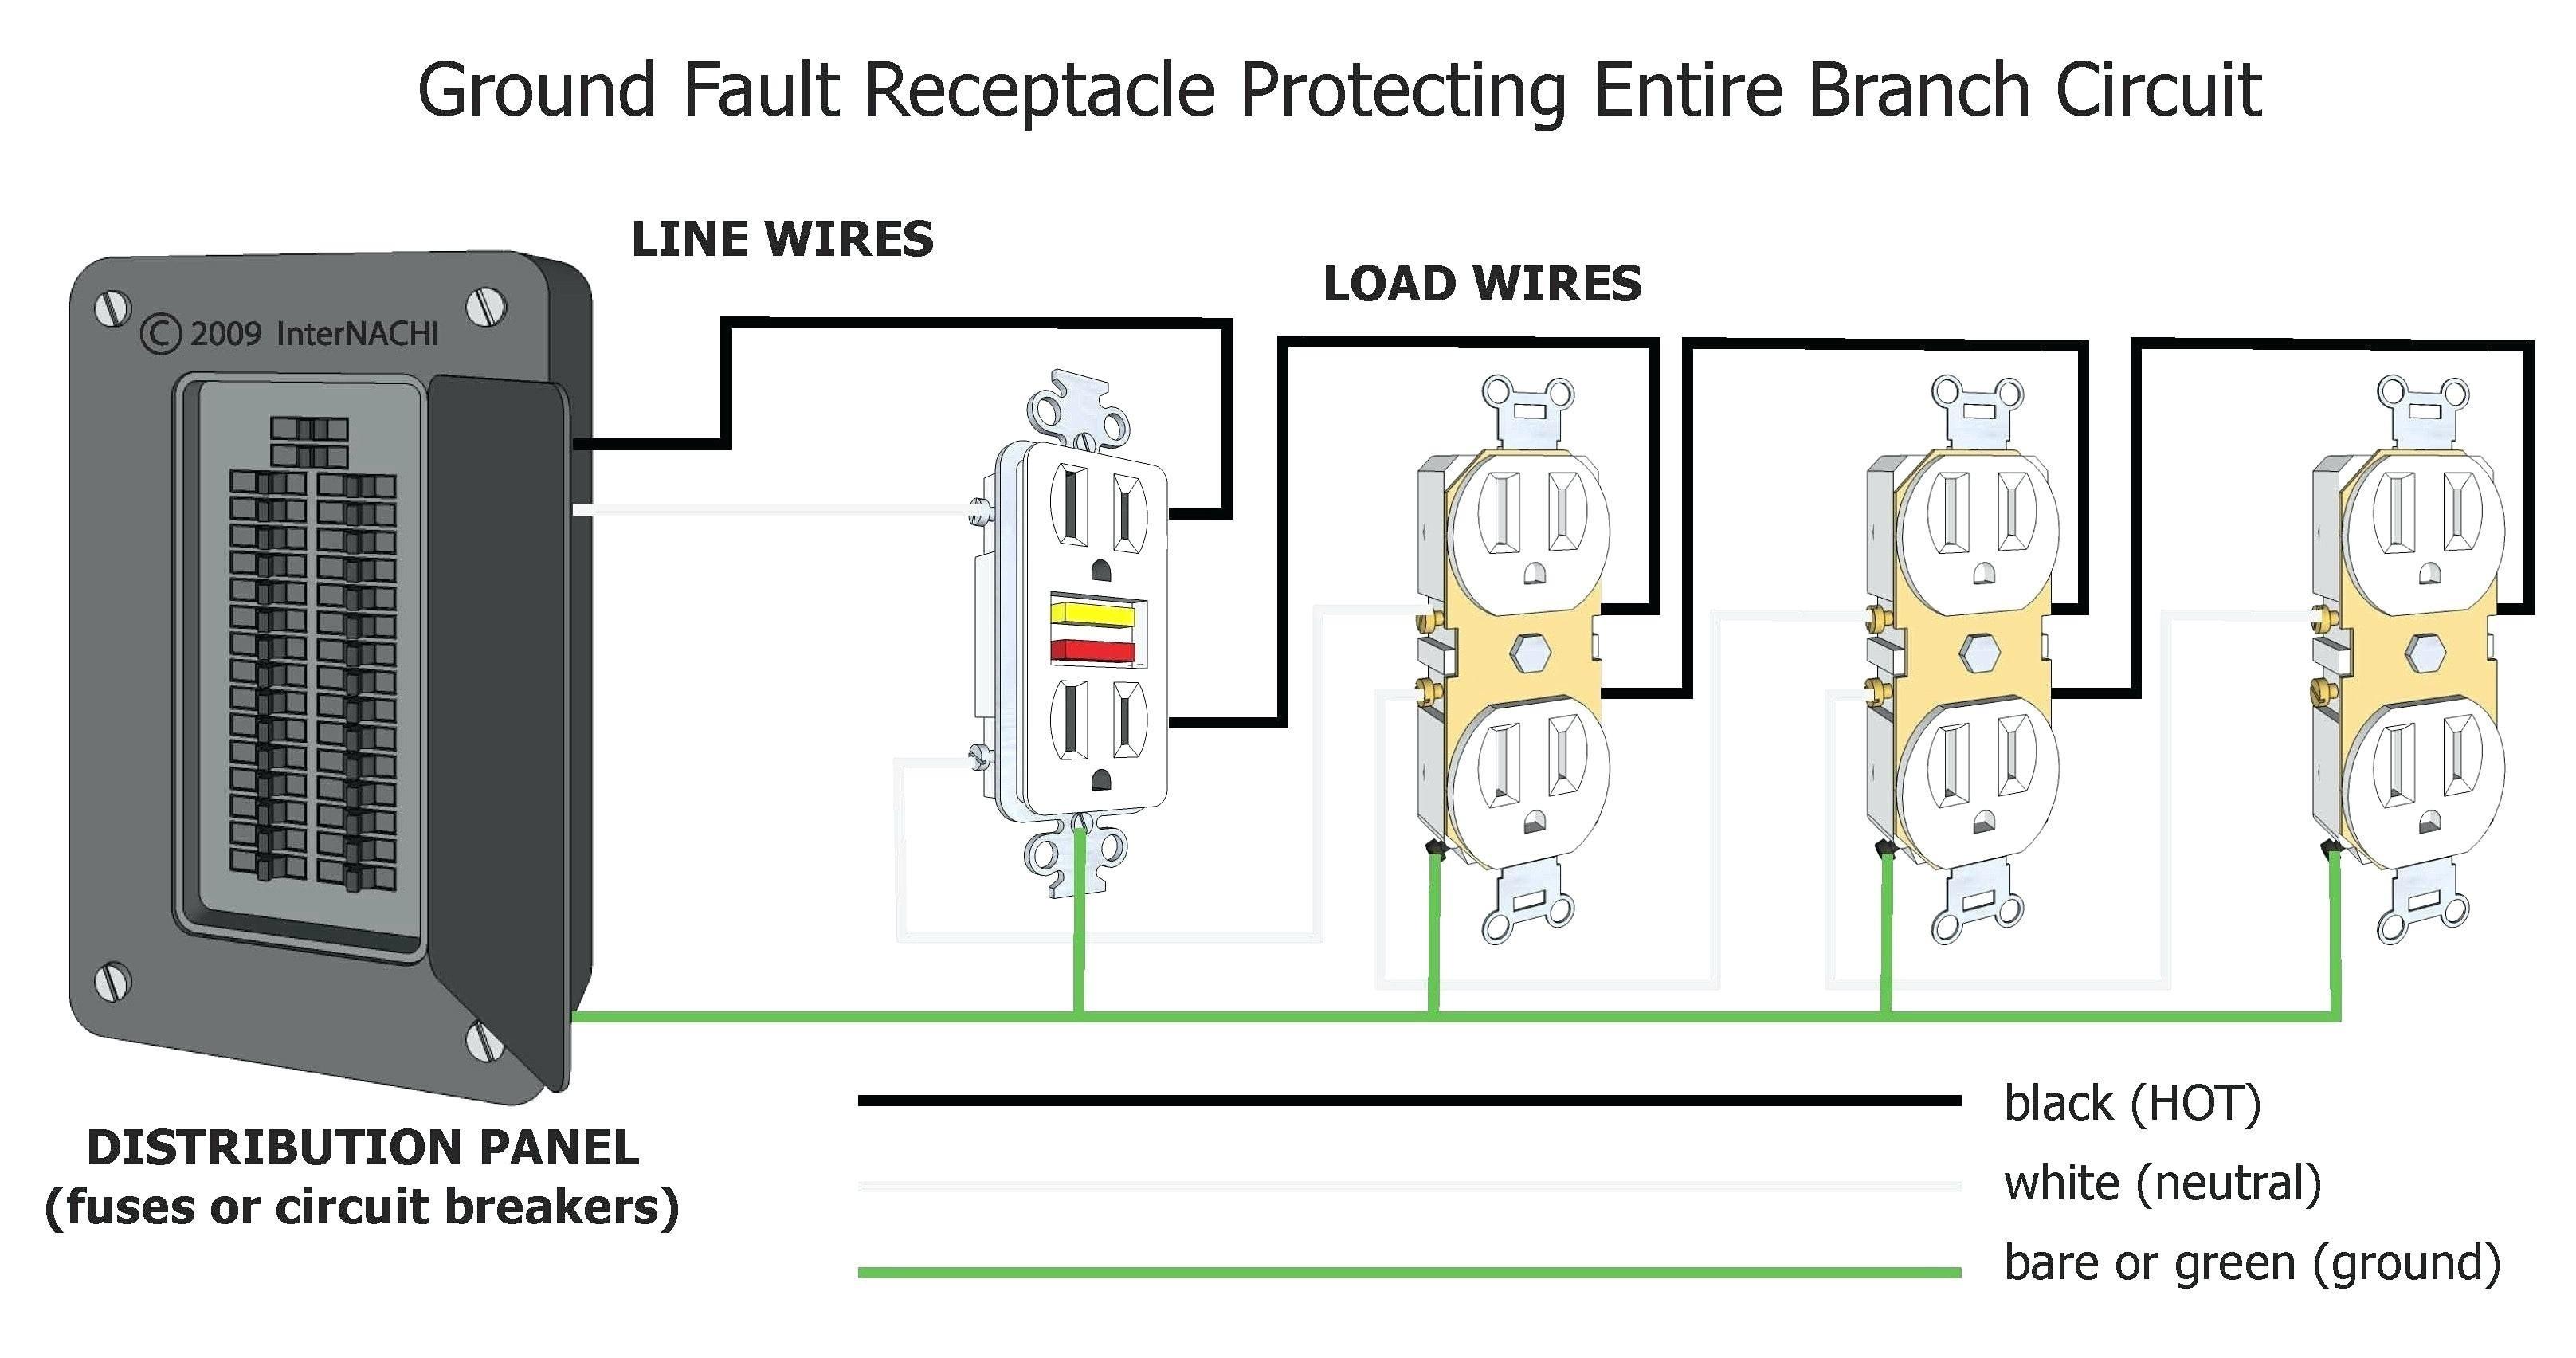 Electrical Circuit Diagram House Wiring New House Electrical Wiring Diagram Australia Valid Circuit Breaker